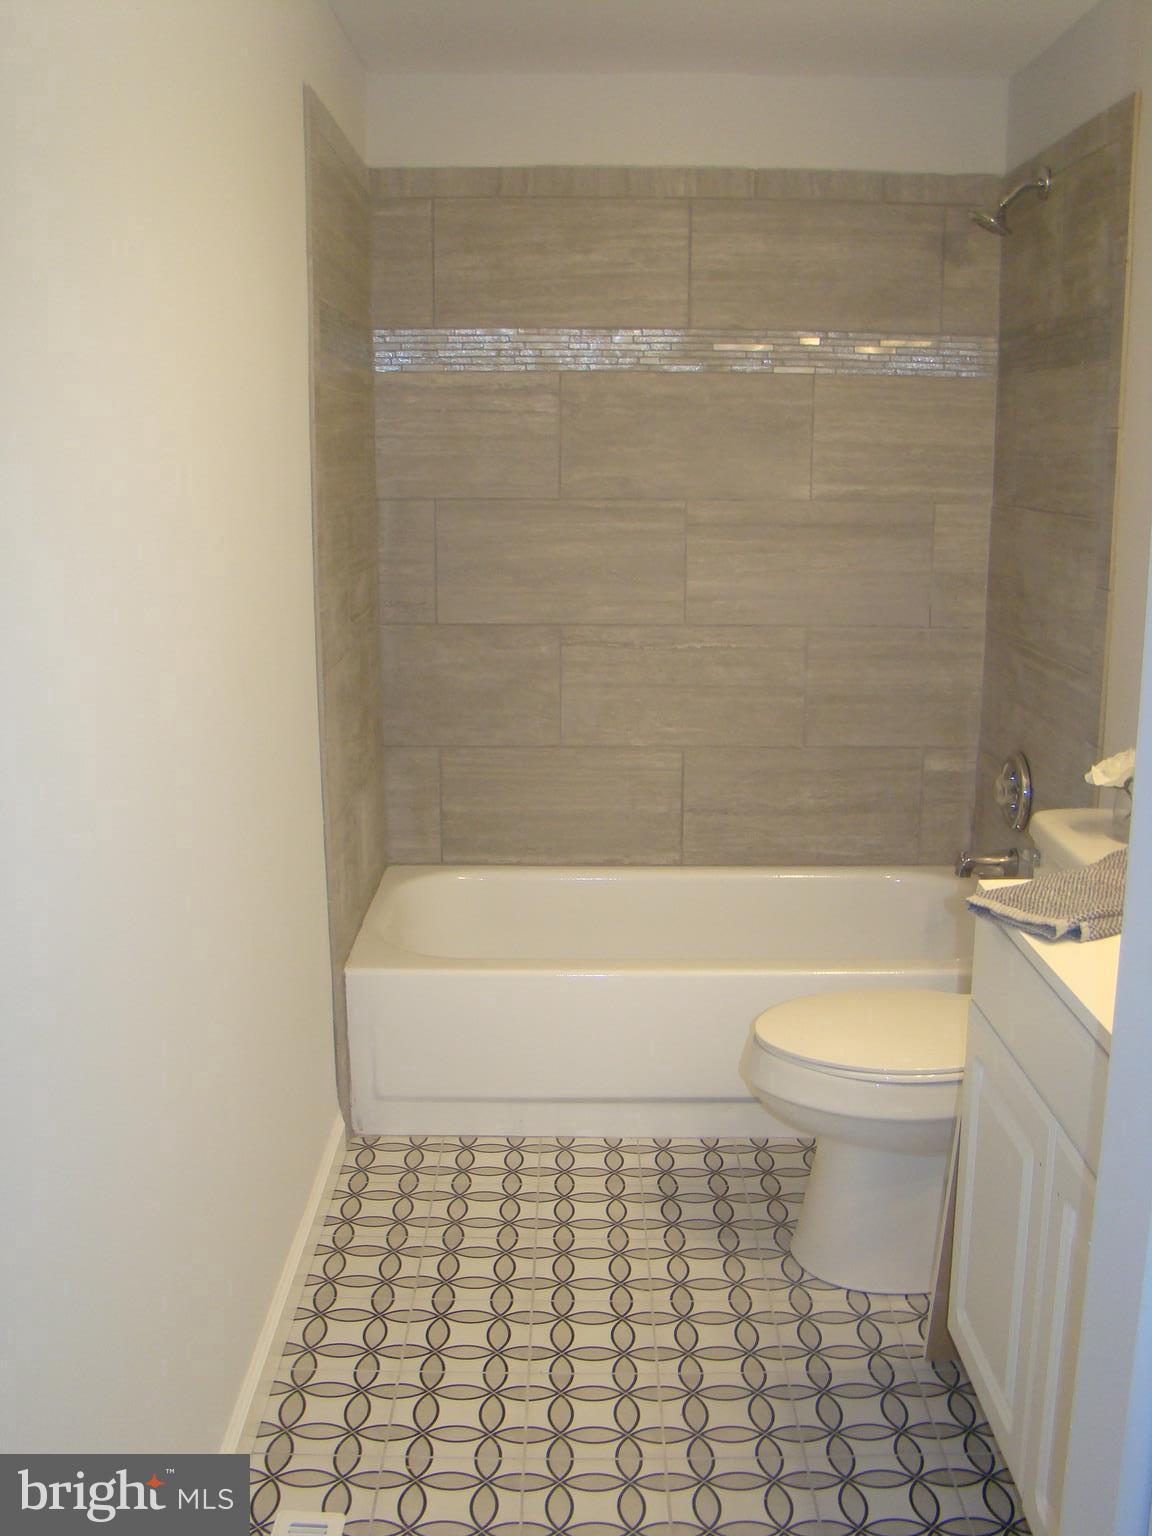 Sold 12 Dorchester Circle Marlton Nj 08053 3 Beds 1 Full Bath 1 Half Bath 192500